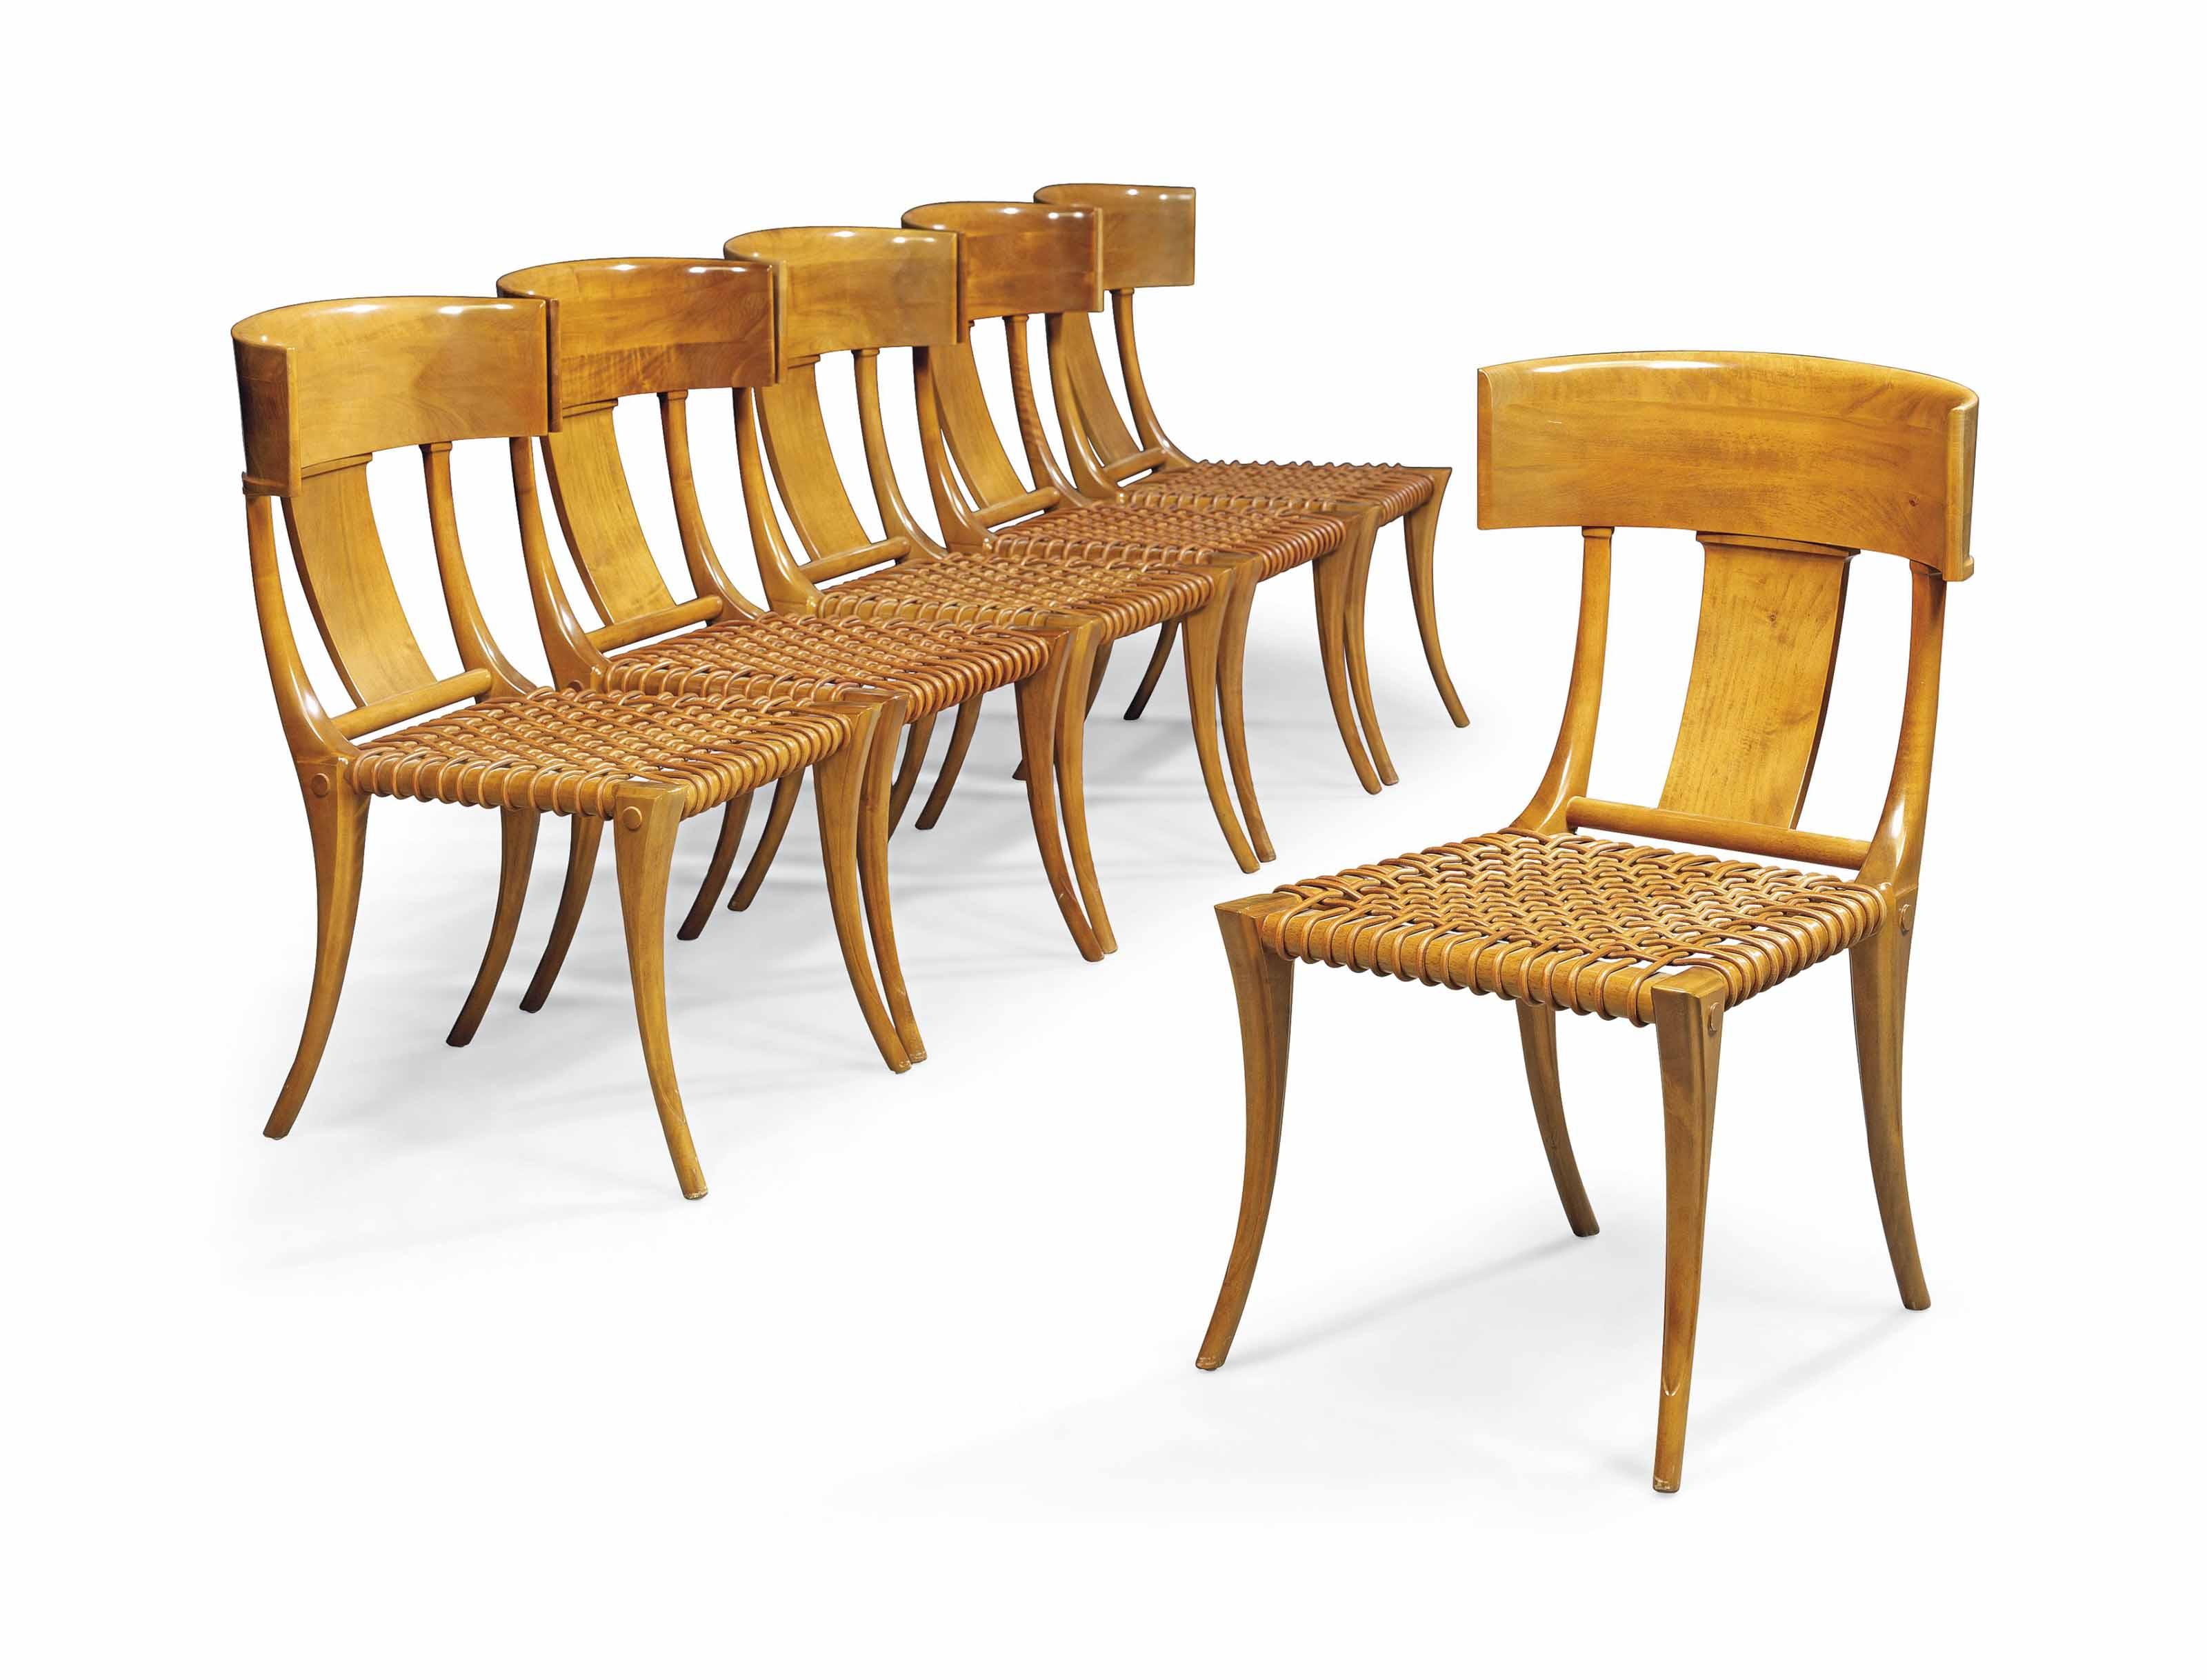 A SET OF SIX  T. H. ROBSJOHN-GIBBINGS (1905-1976) WALNUT KLISMOS' CHAIRS